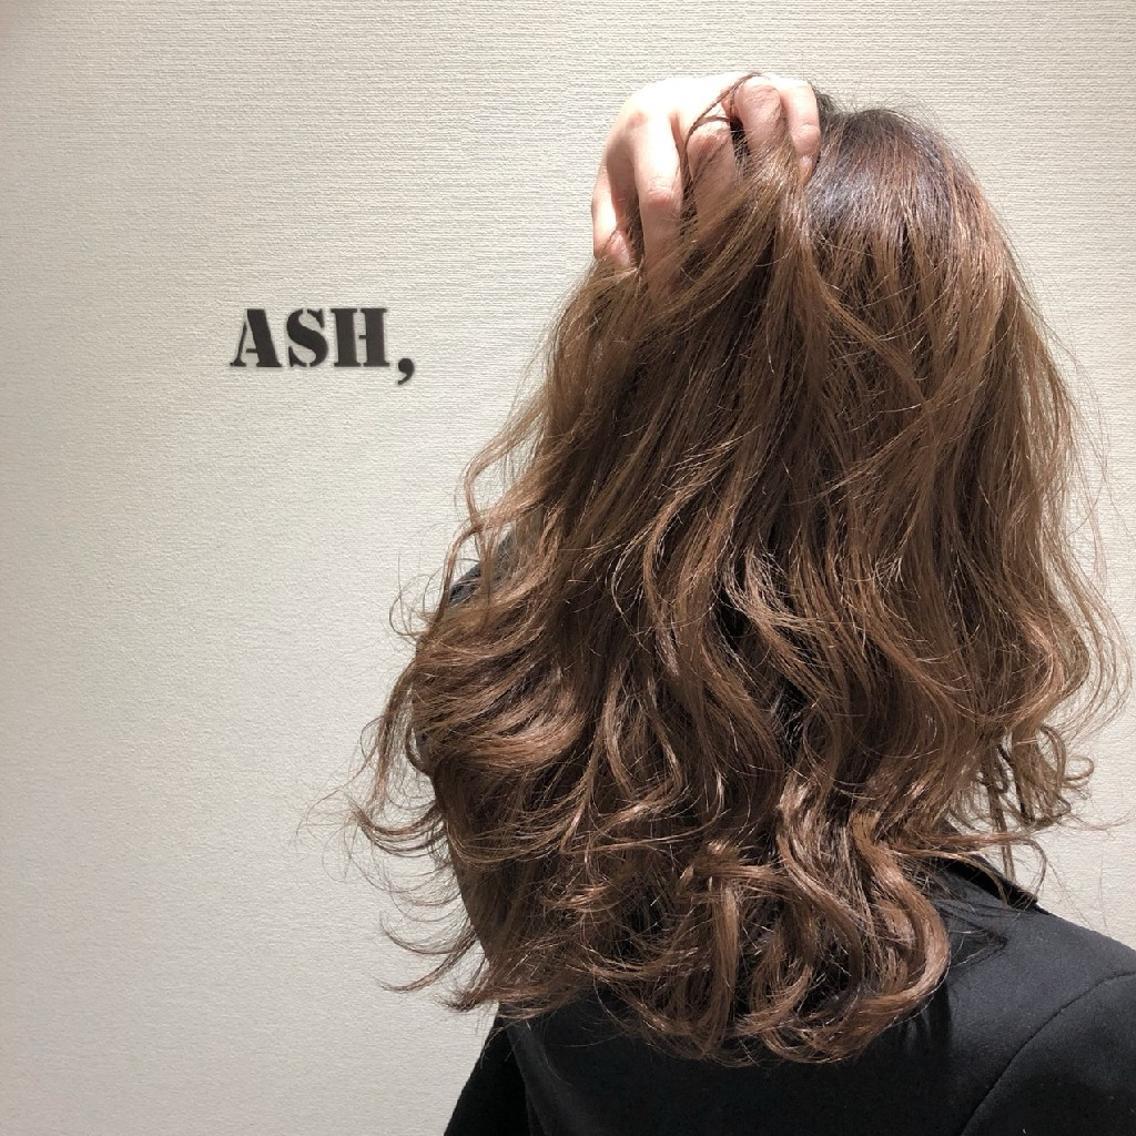 Ash東神奈川所属・Ash東神奈川店の掲載